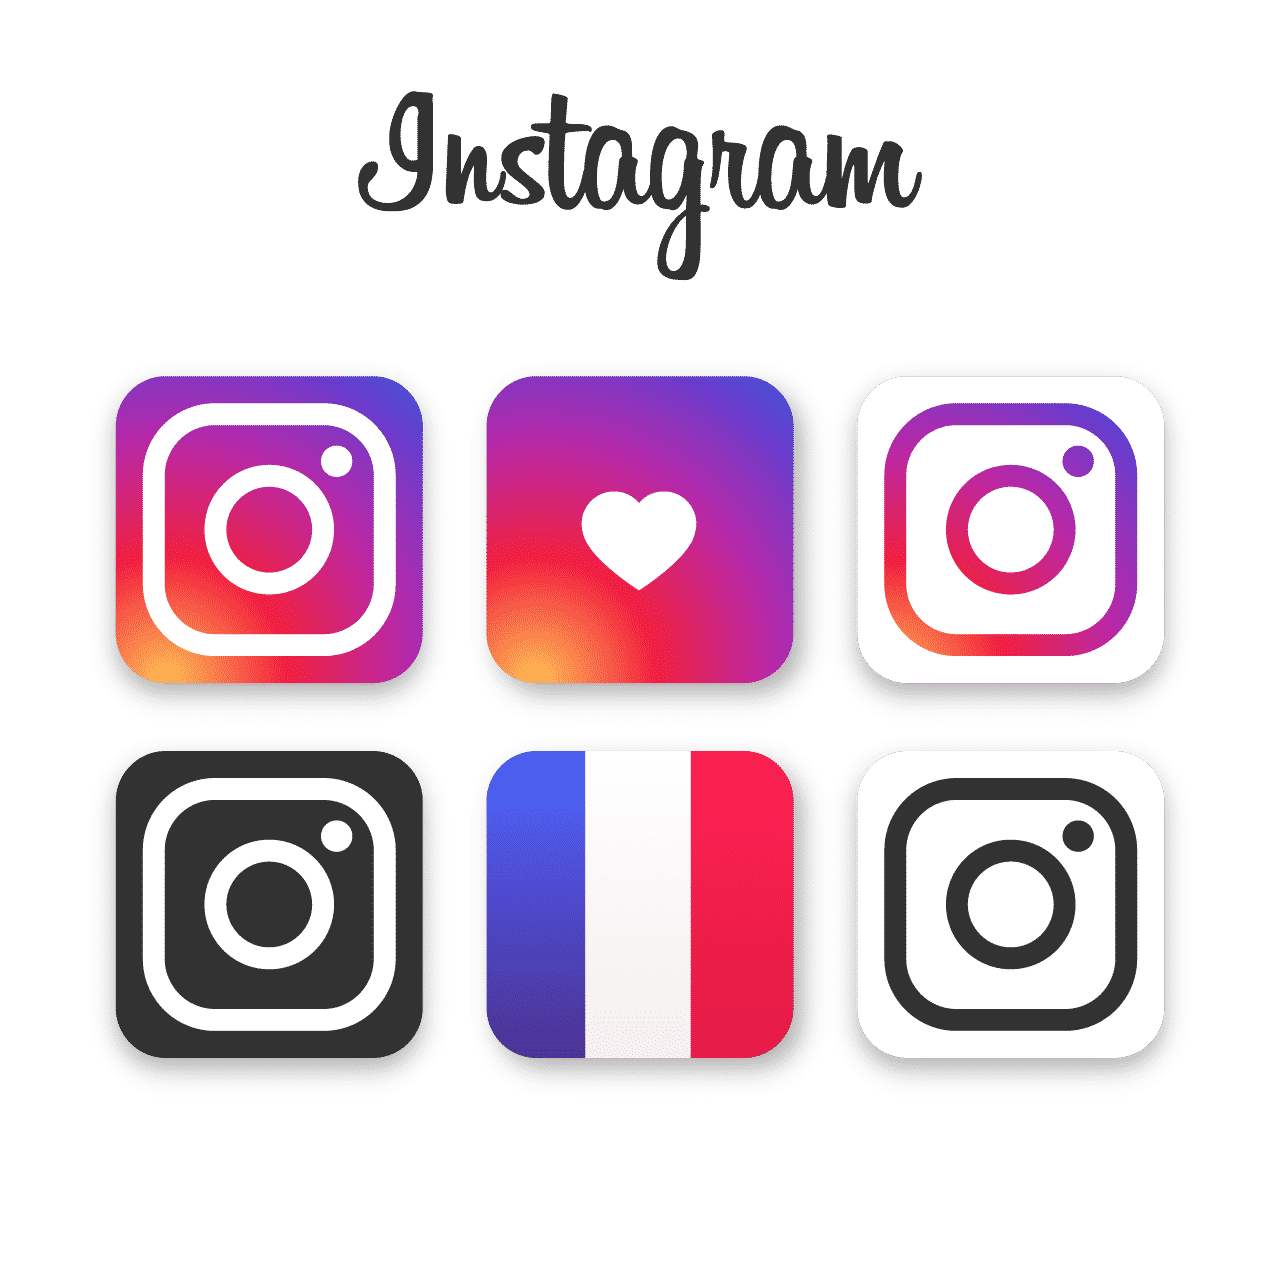 complementa-tu-aprendizaje-del-frances-en-instagram